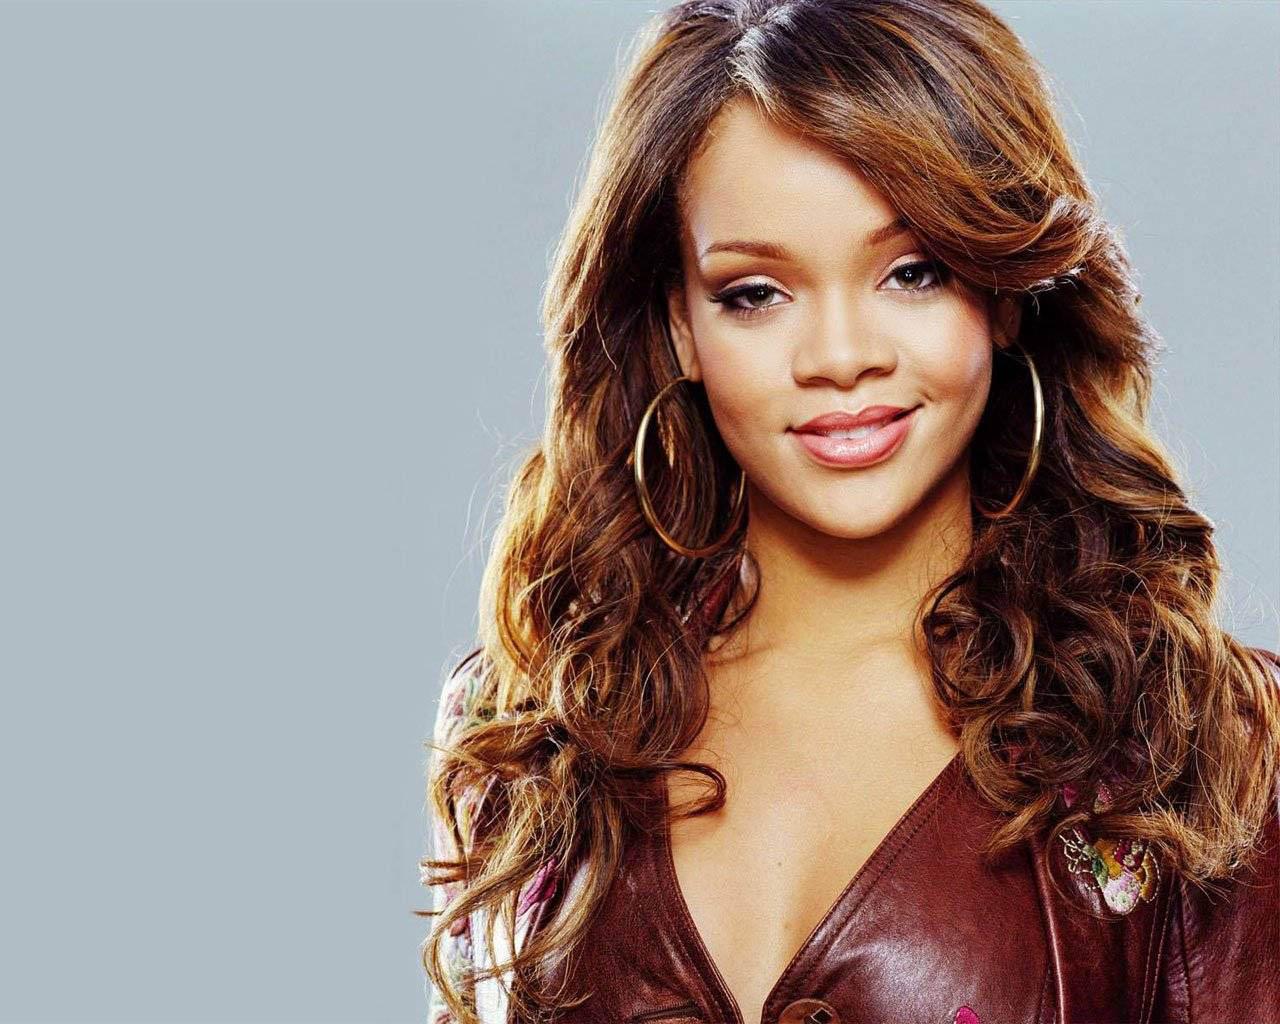 Rihanna music photo rihanna music voltagebd Images